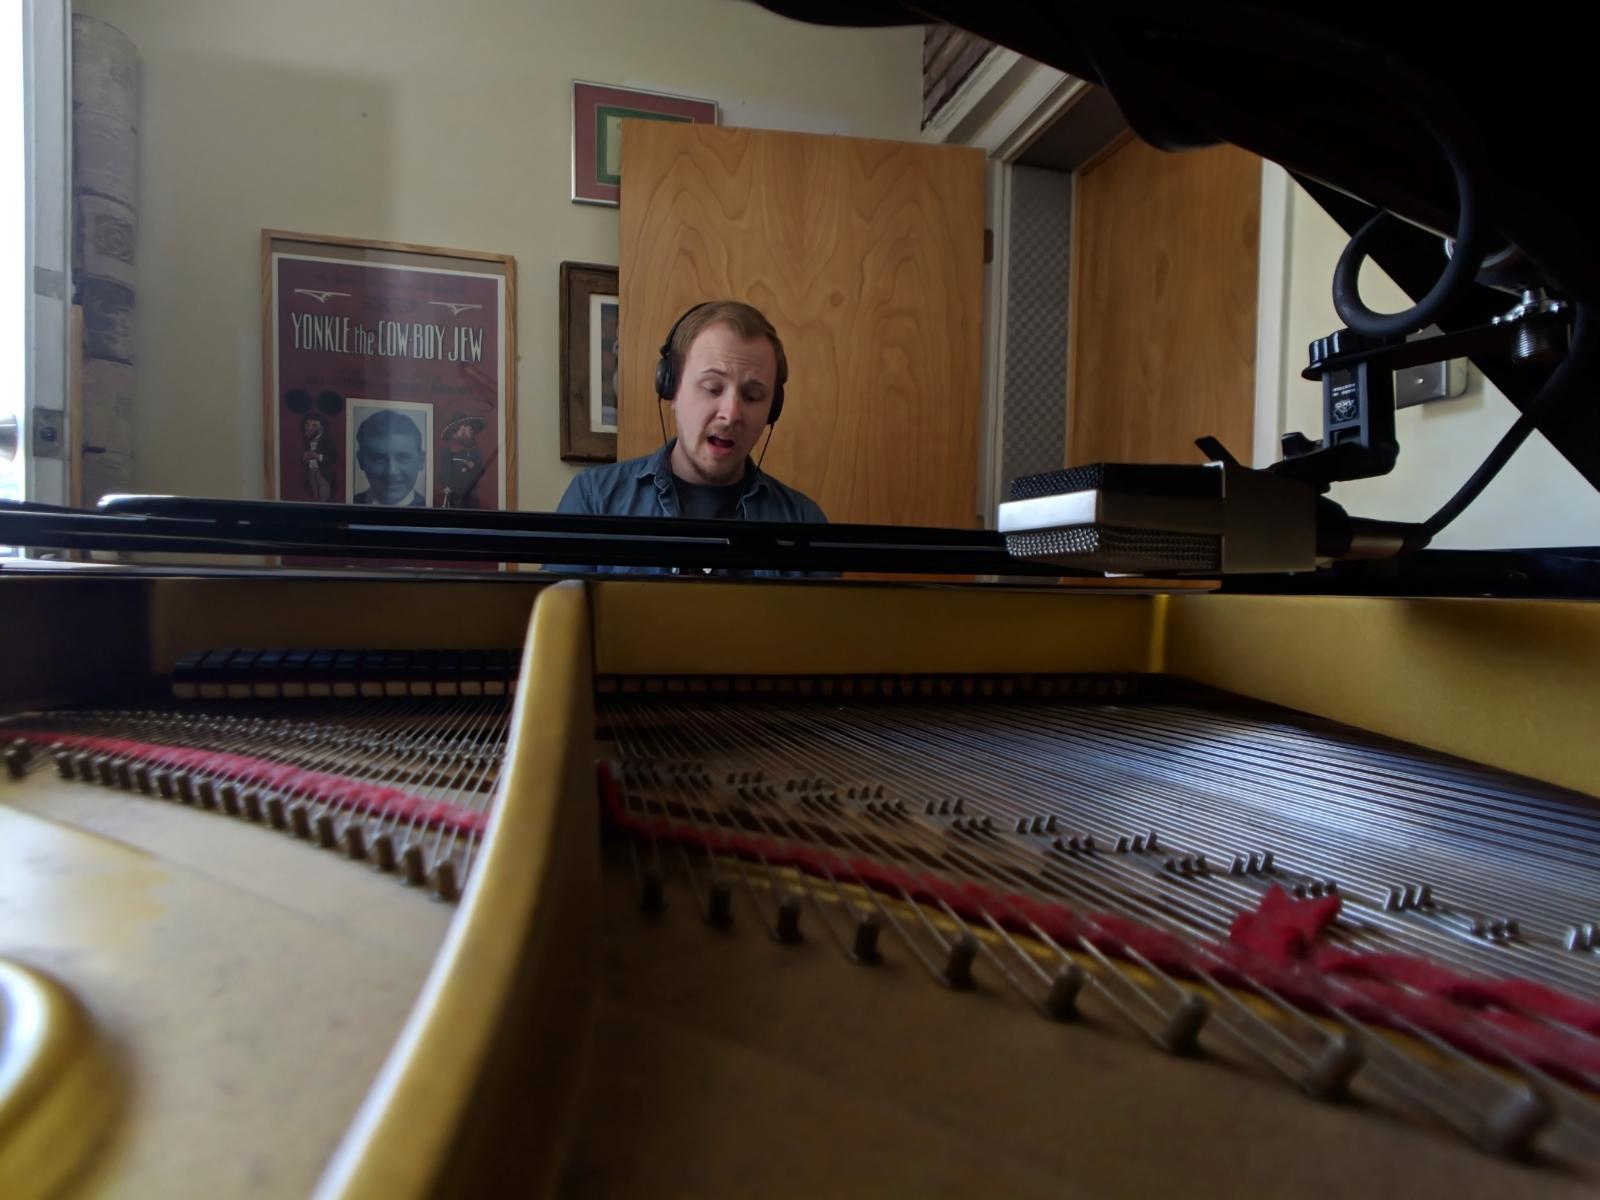 Real Yamaha grand piano, with disklavier midi read/write.